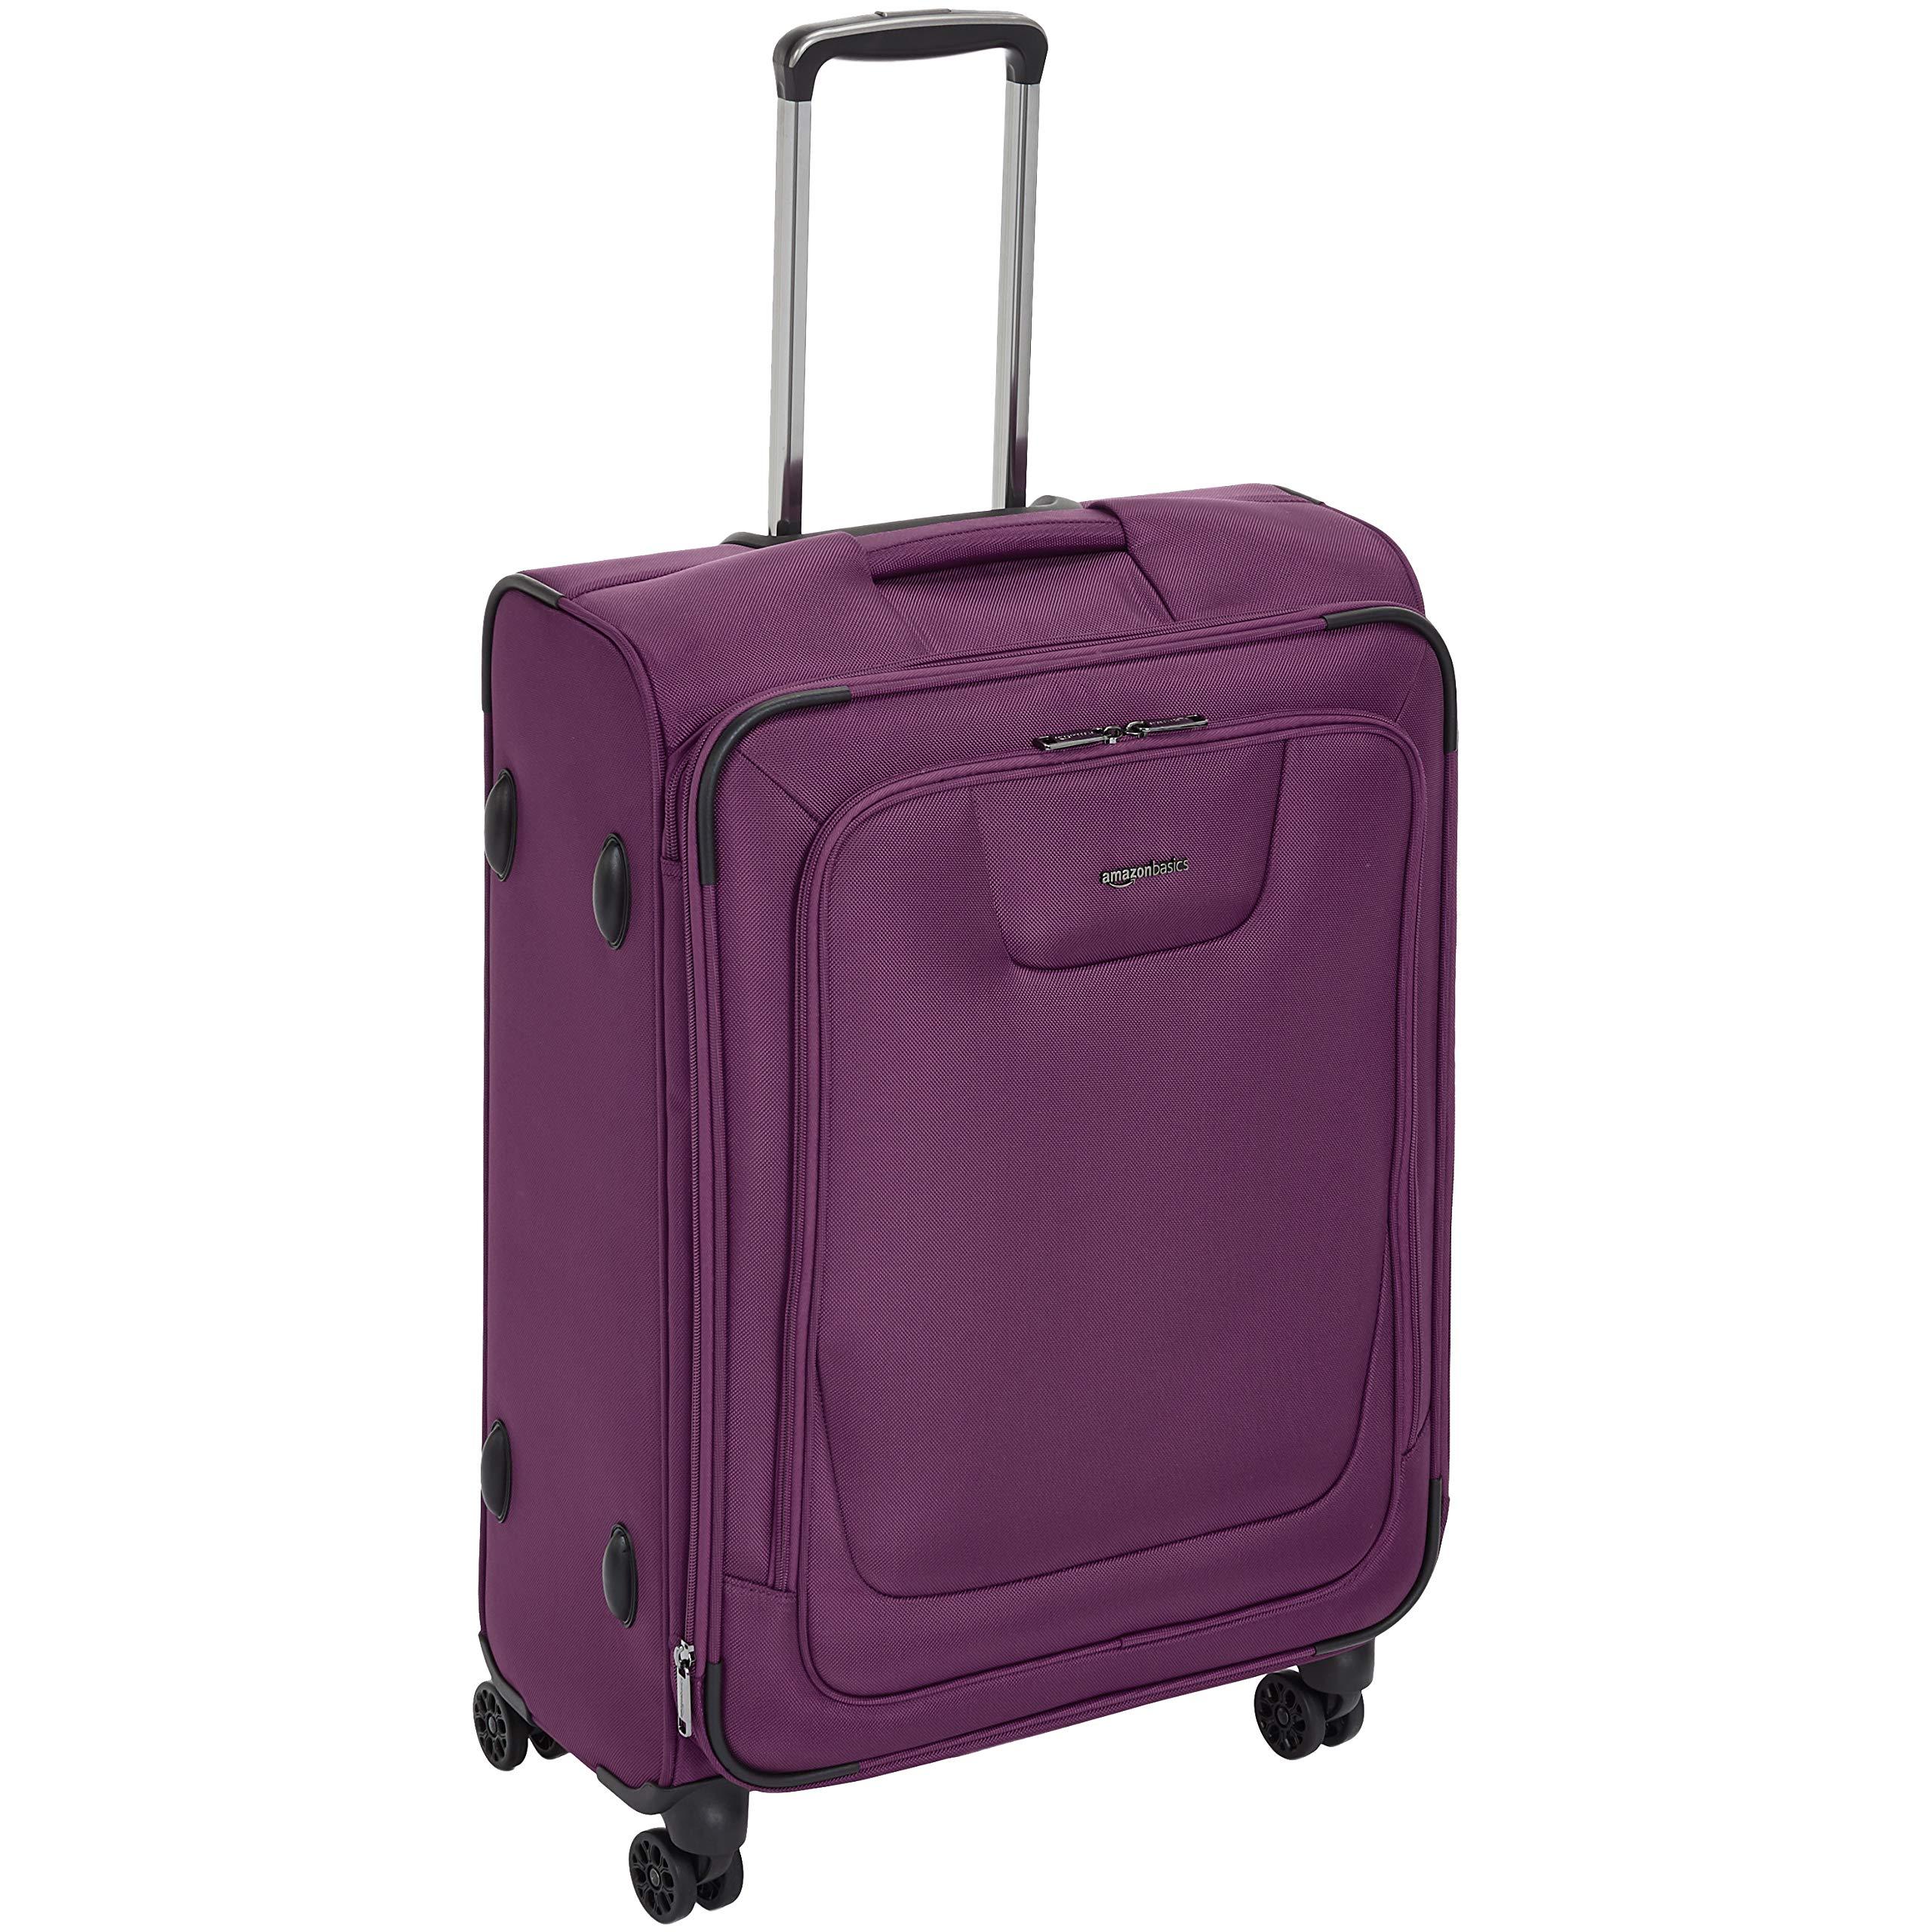 AmazonBasics Premium Expandable Softside Spinner Luggage With TSA Lock- 25 Inch, Purple